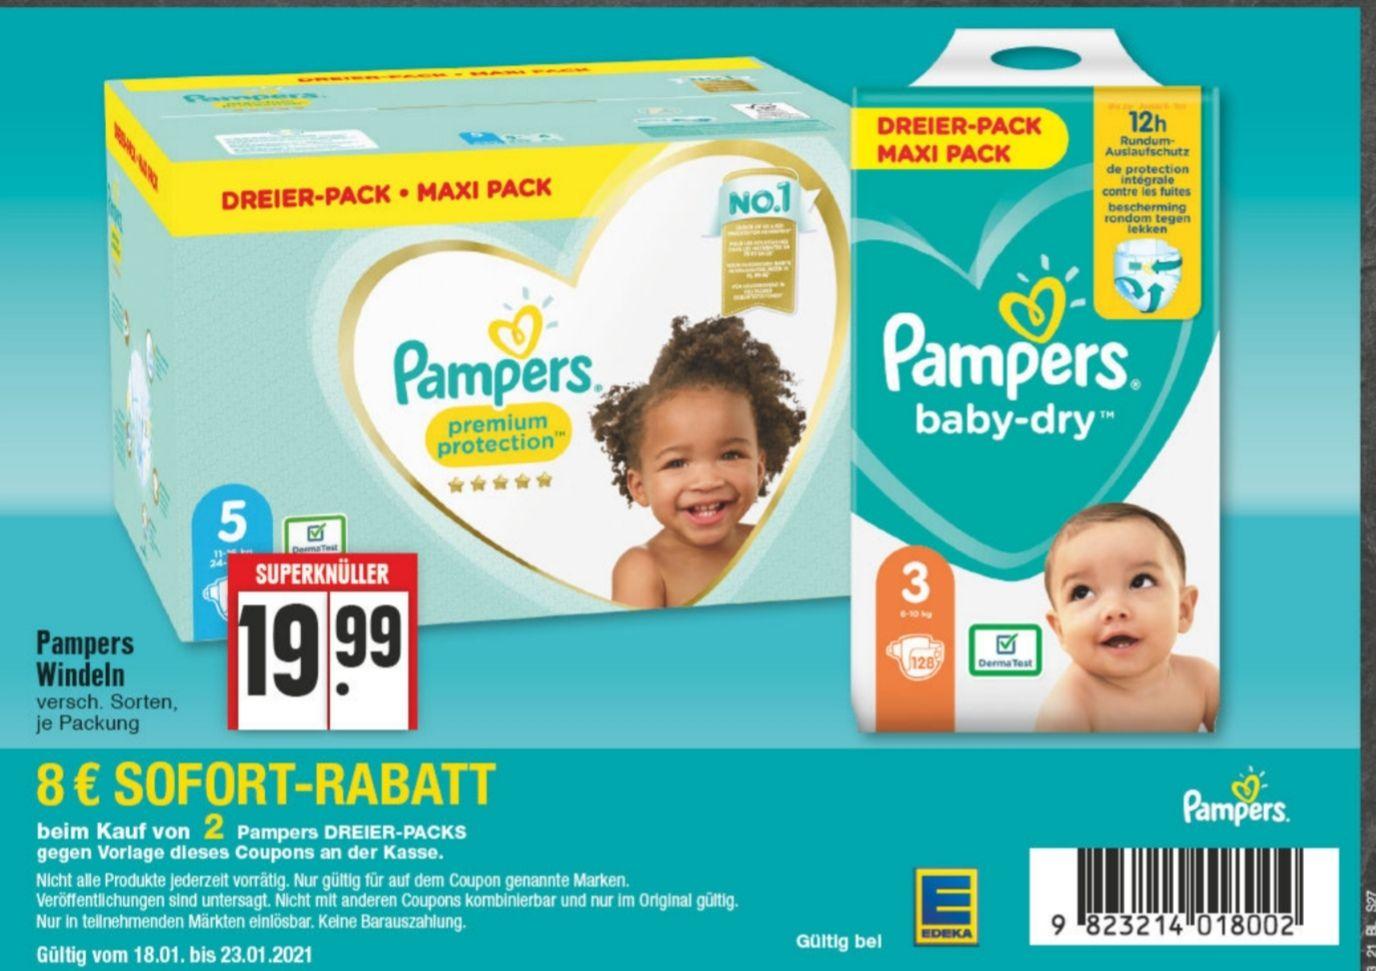 [NRW Edeka] Pampers baby-dry, Premium Protection etc. Dreierpack 8€ Rabatt